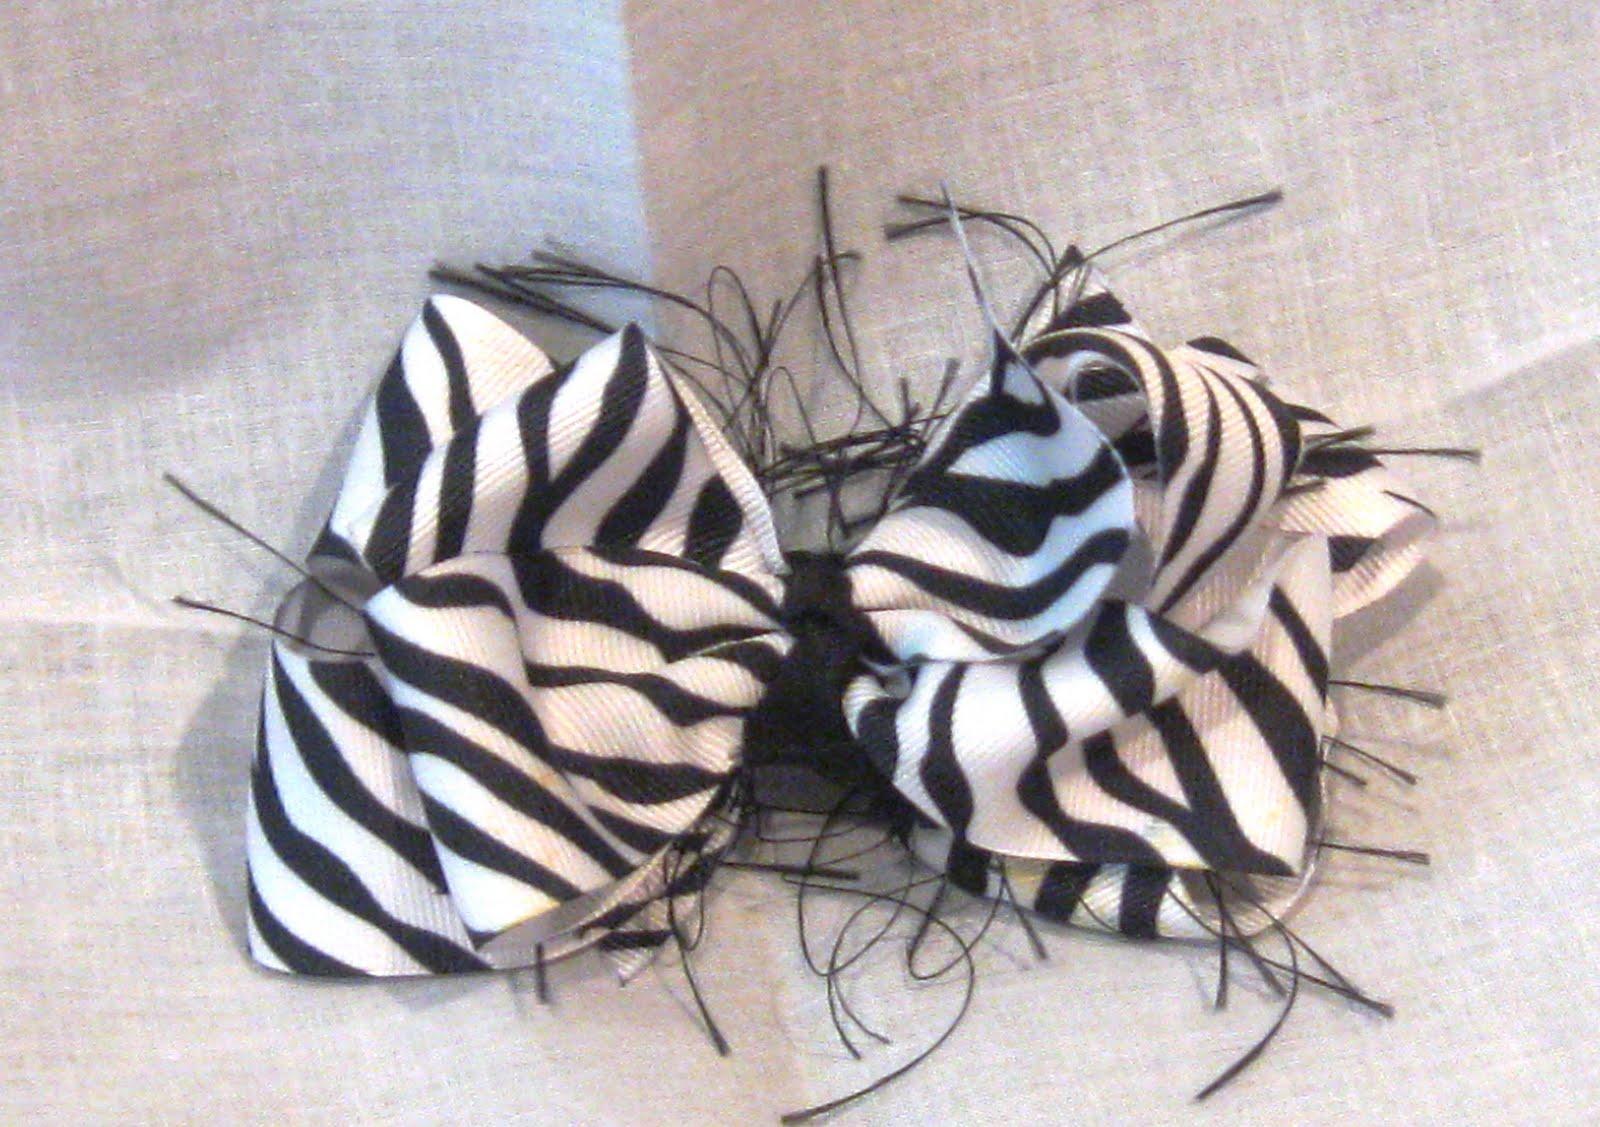 foto zebra - gambar hewan - foto zebra